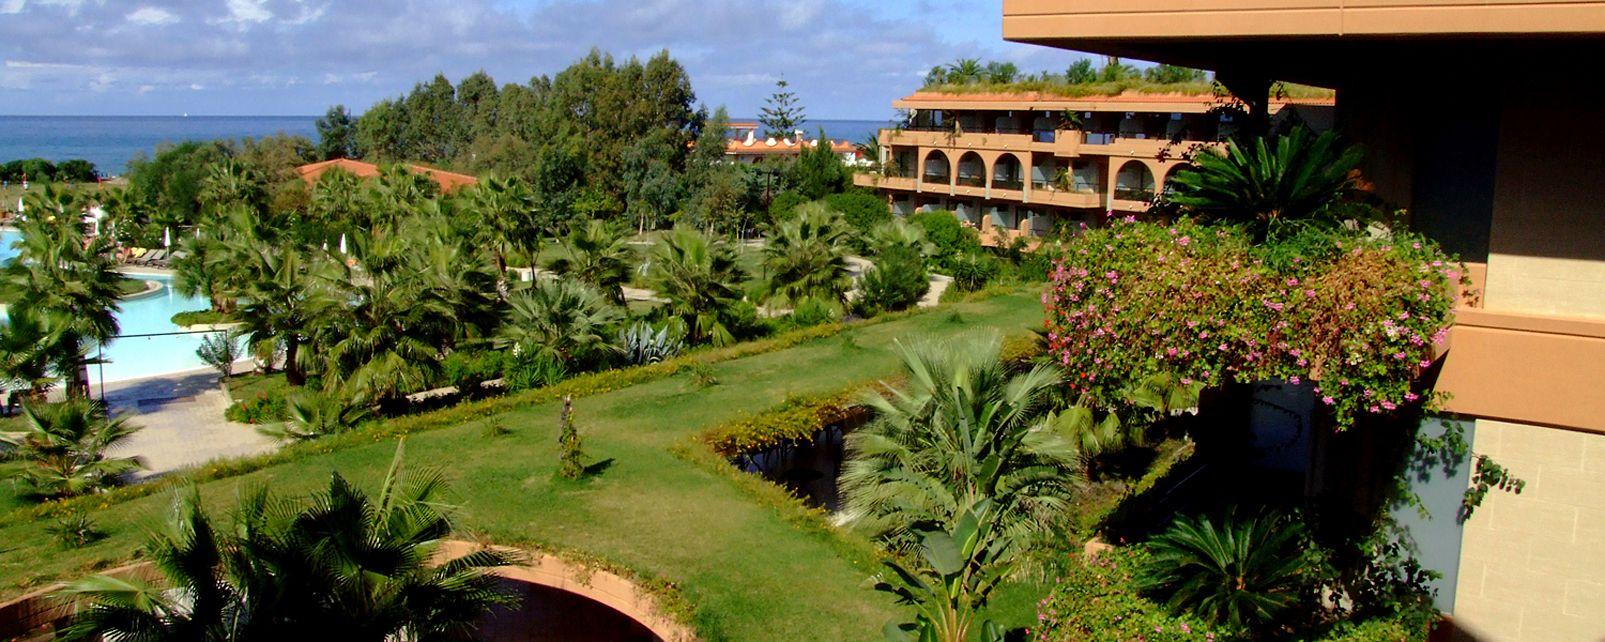 Hôtel Acacia Resort